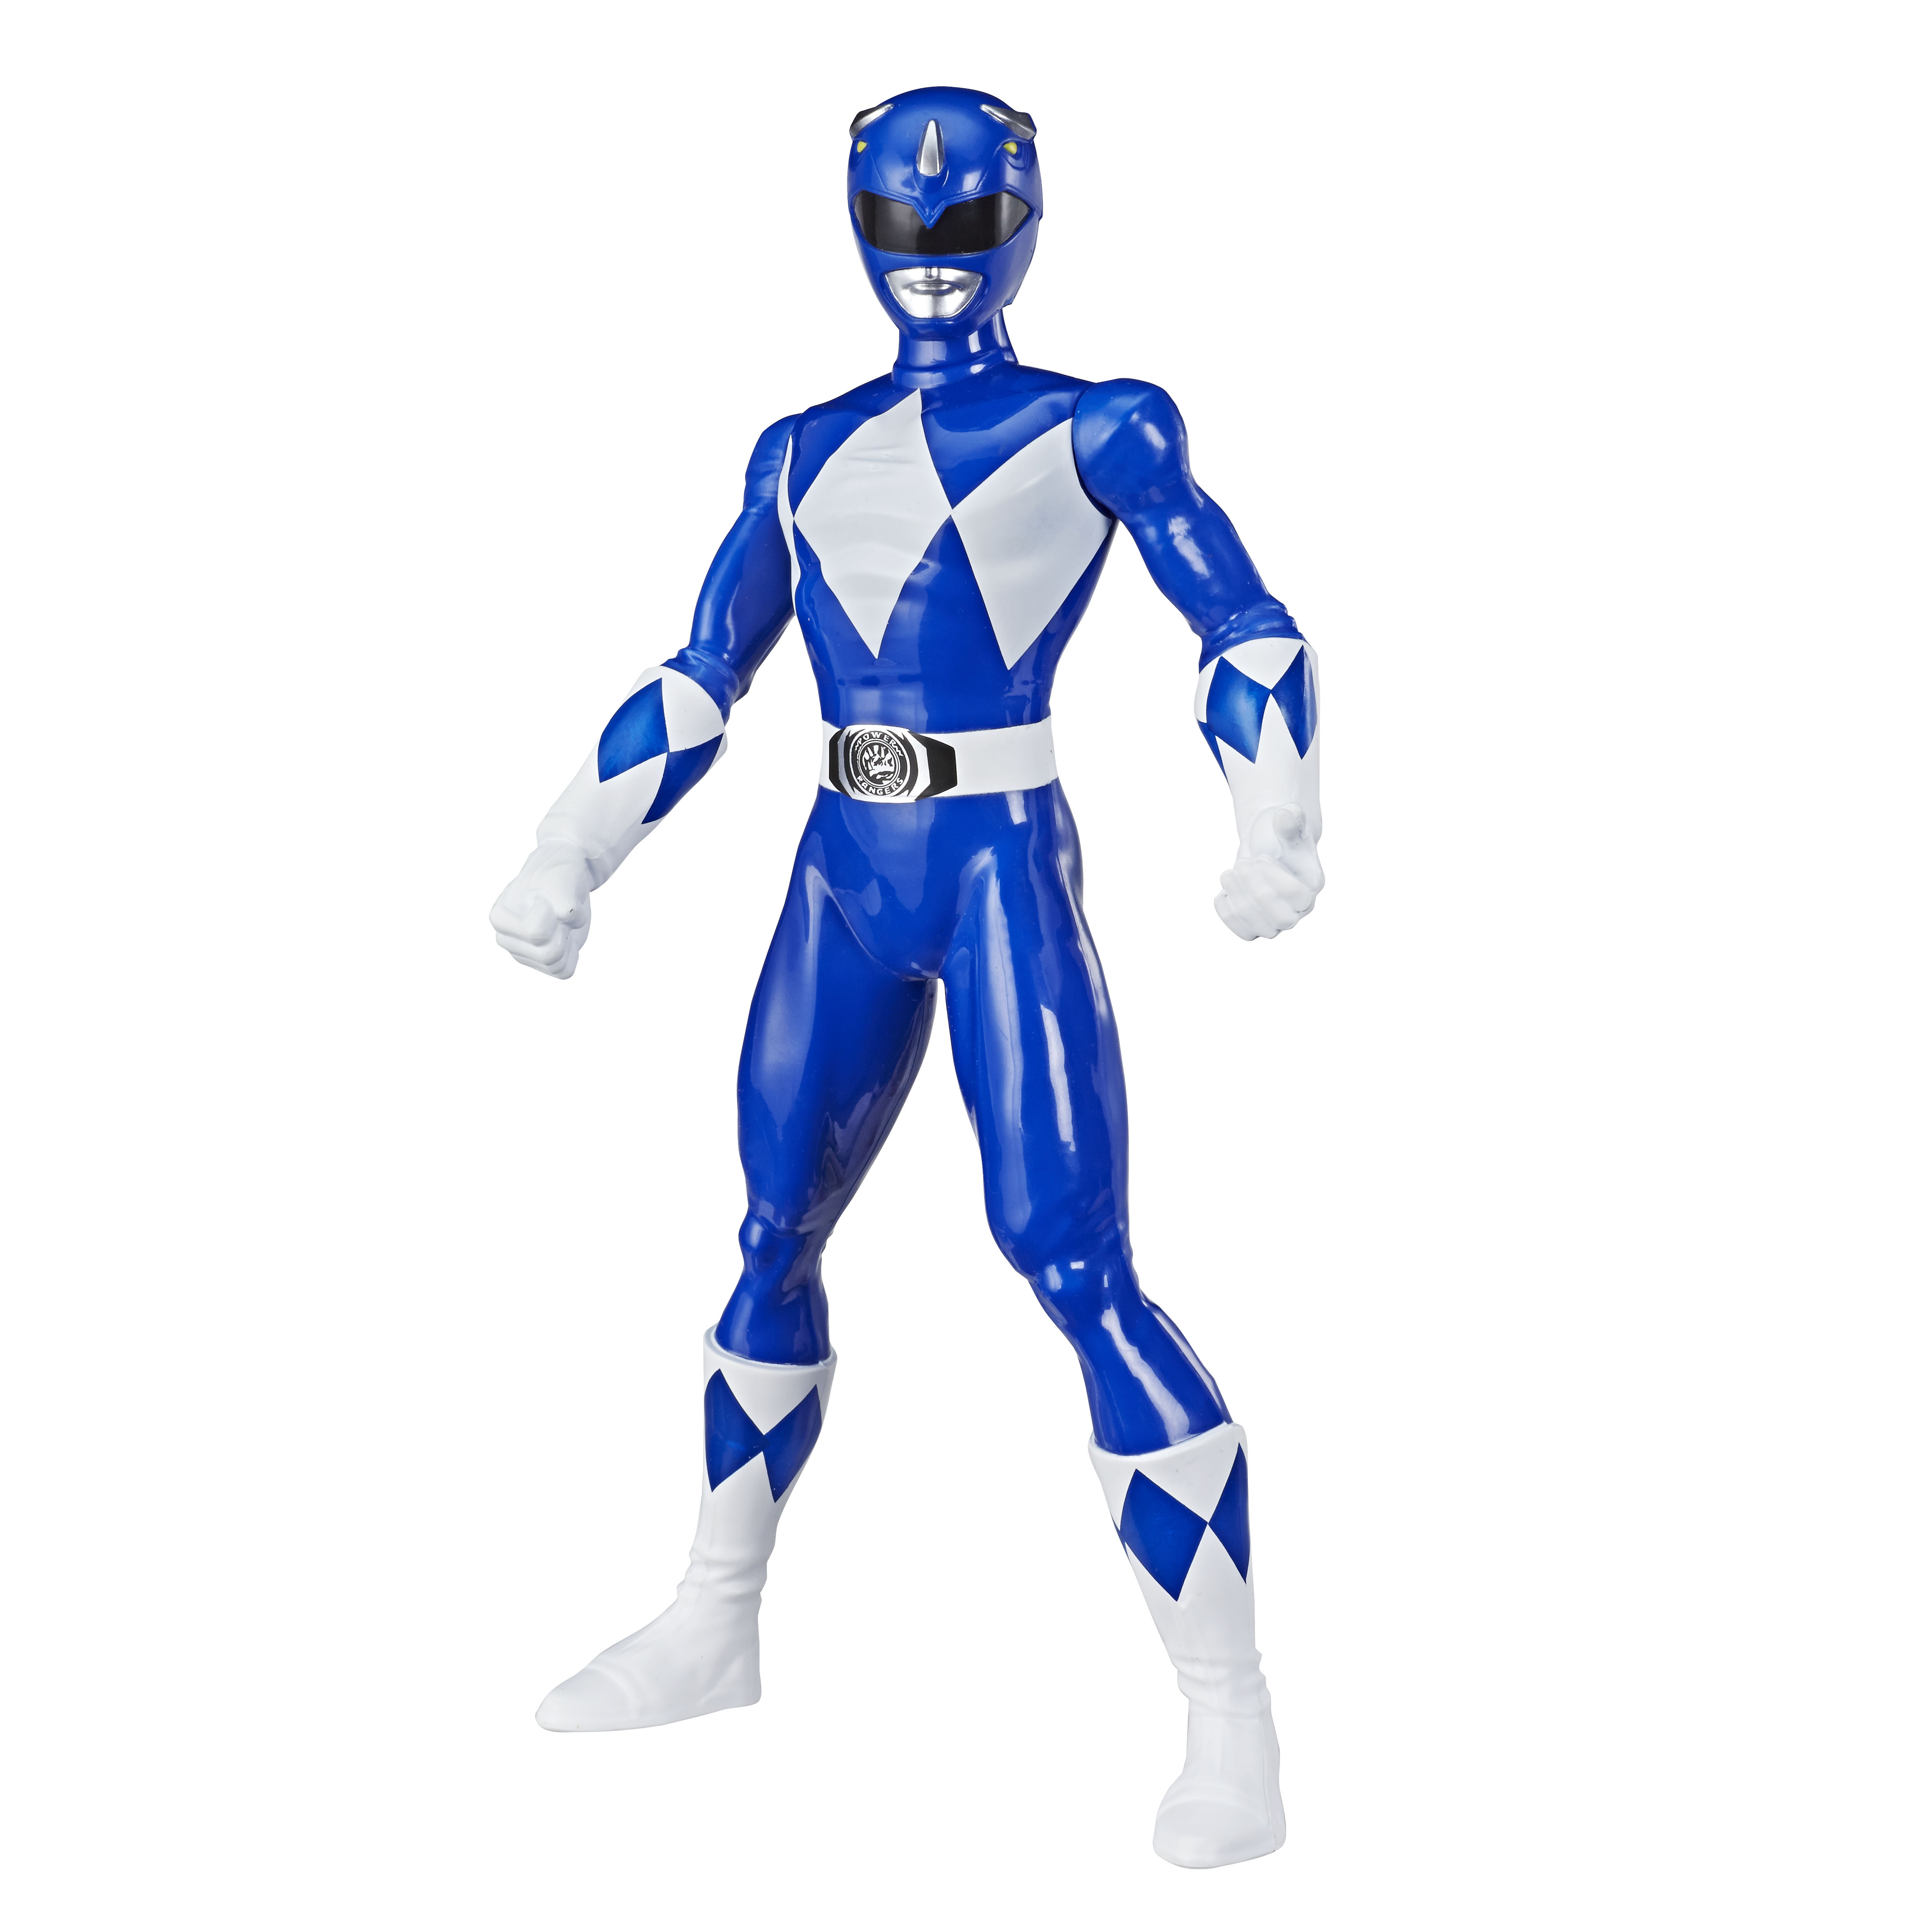 E7899 MMPR 9.5 Inch Basic Figures Blue Ranger_OOP